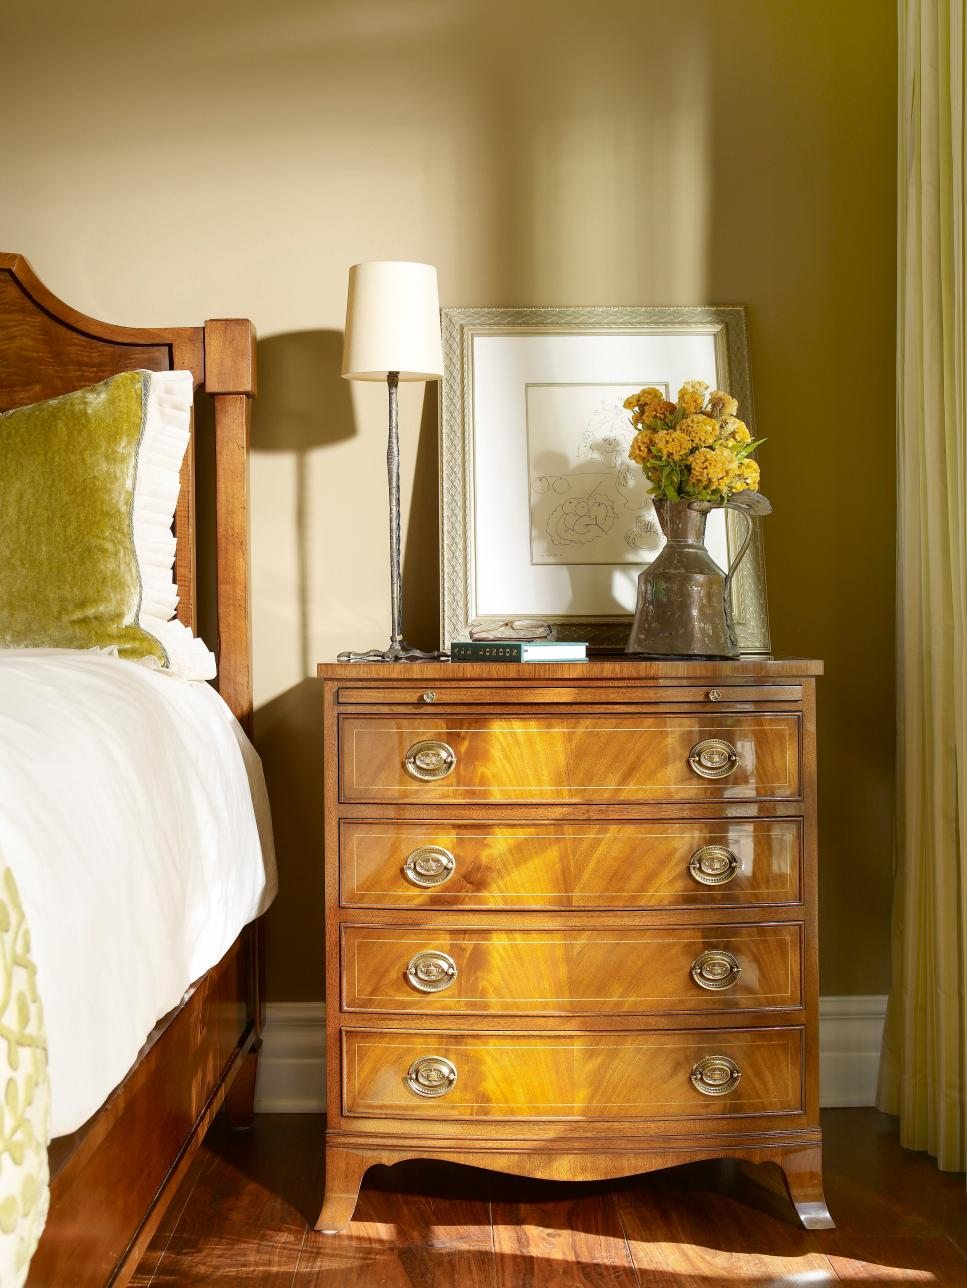 Local Bedroom Furniture Stores Chic Bedroom Storage Hgtv